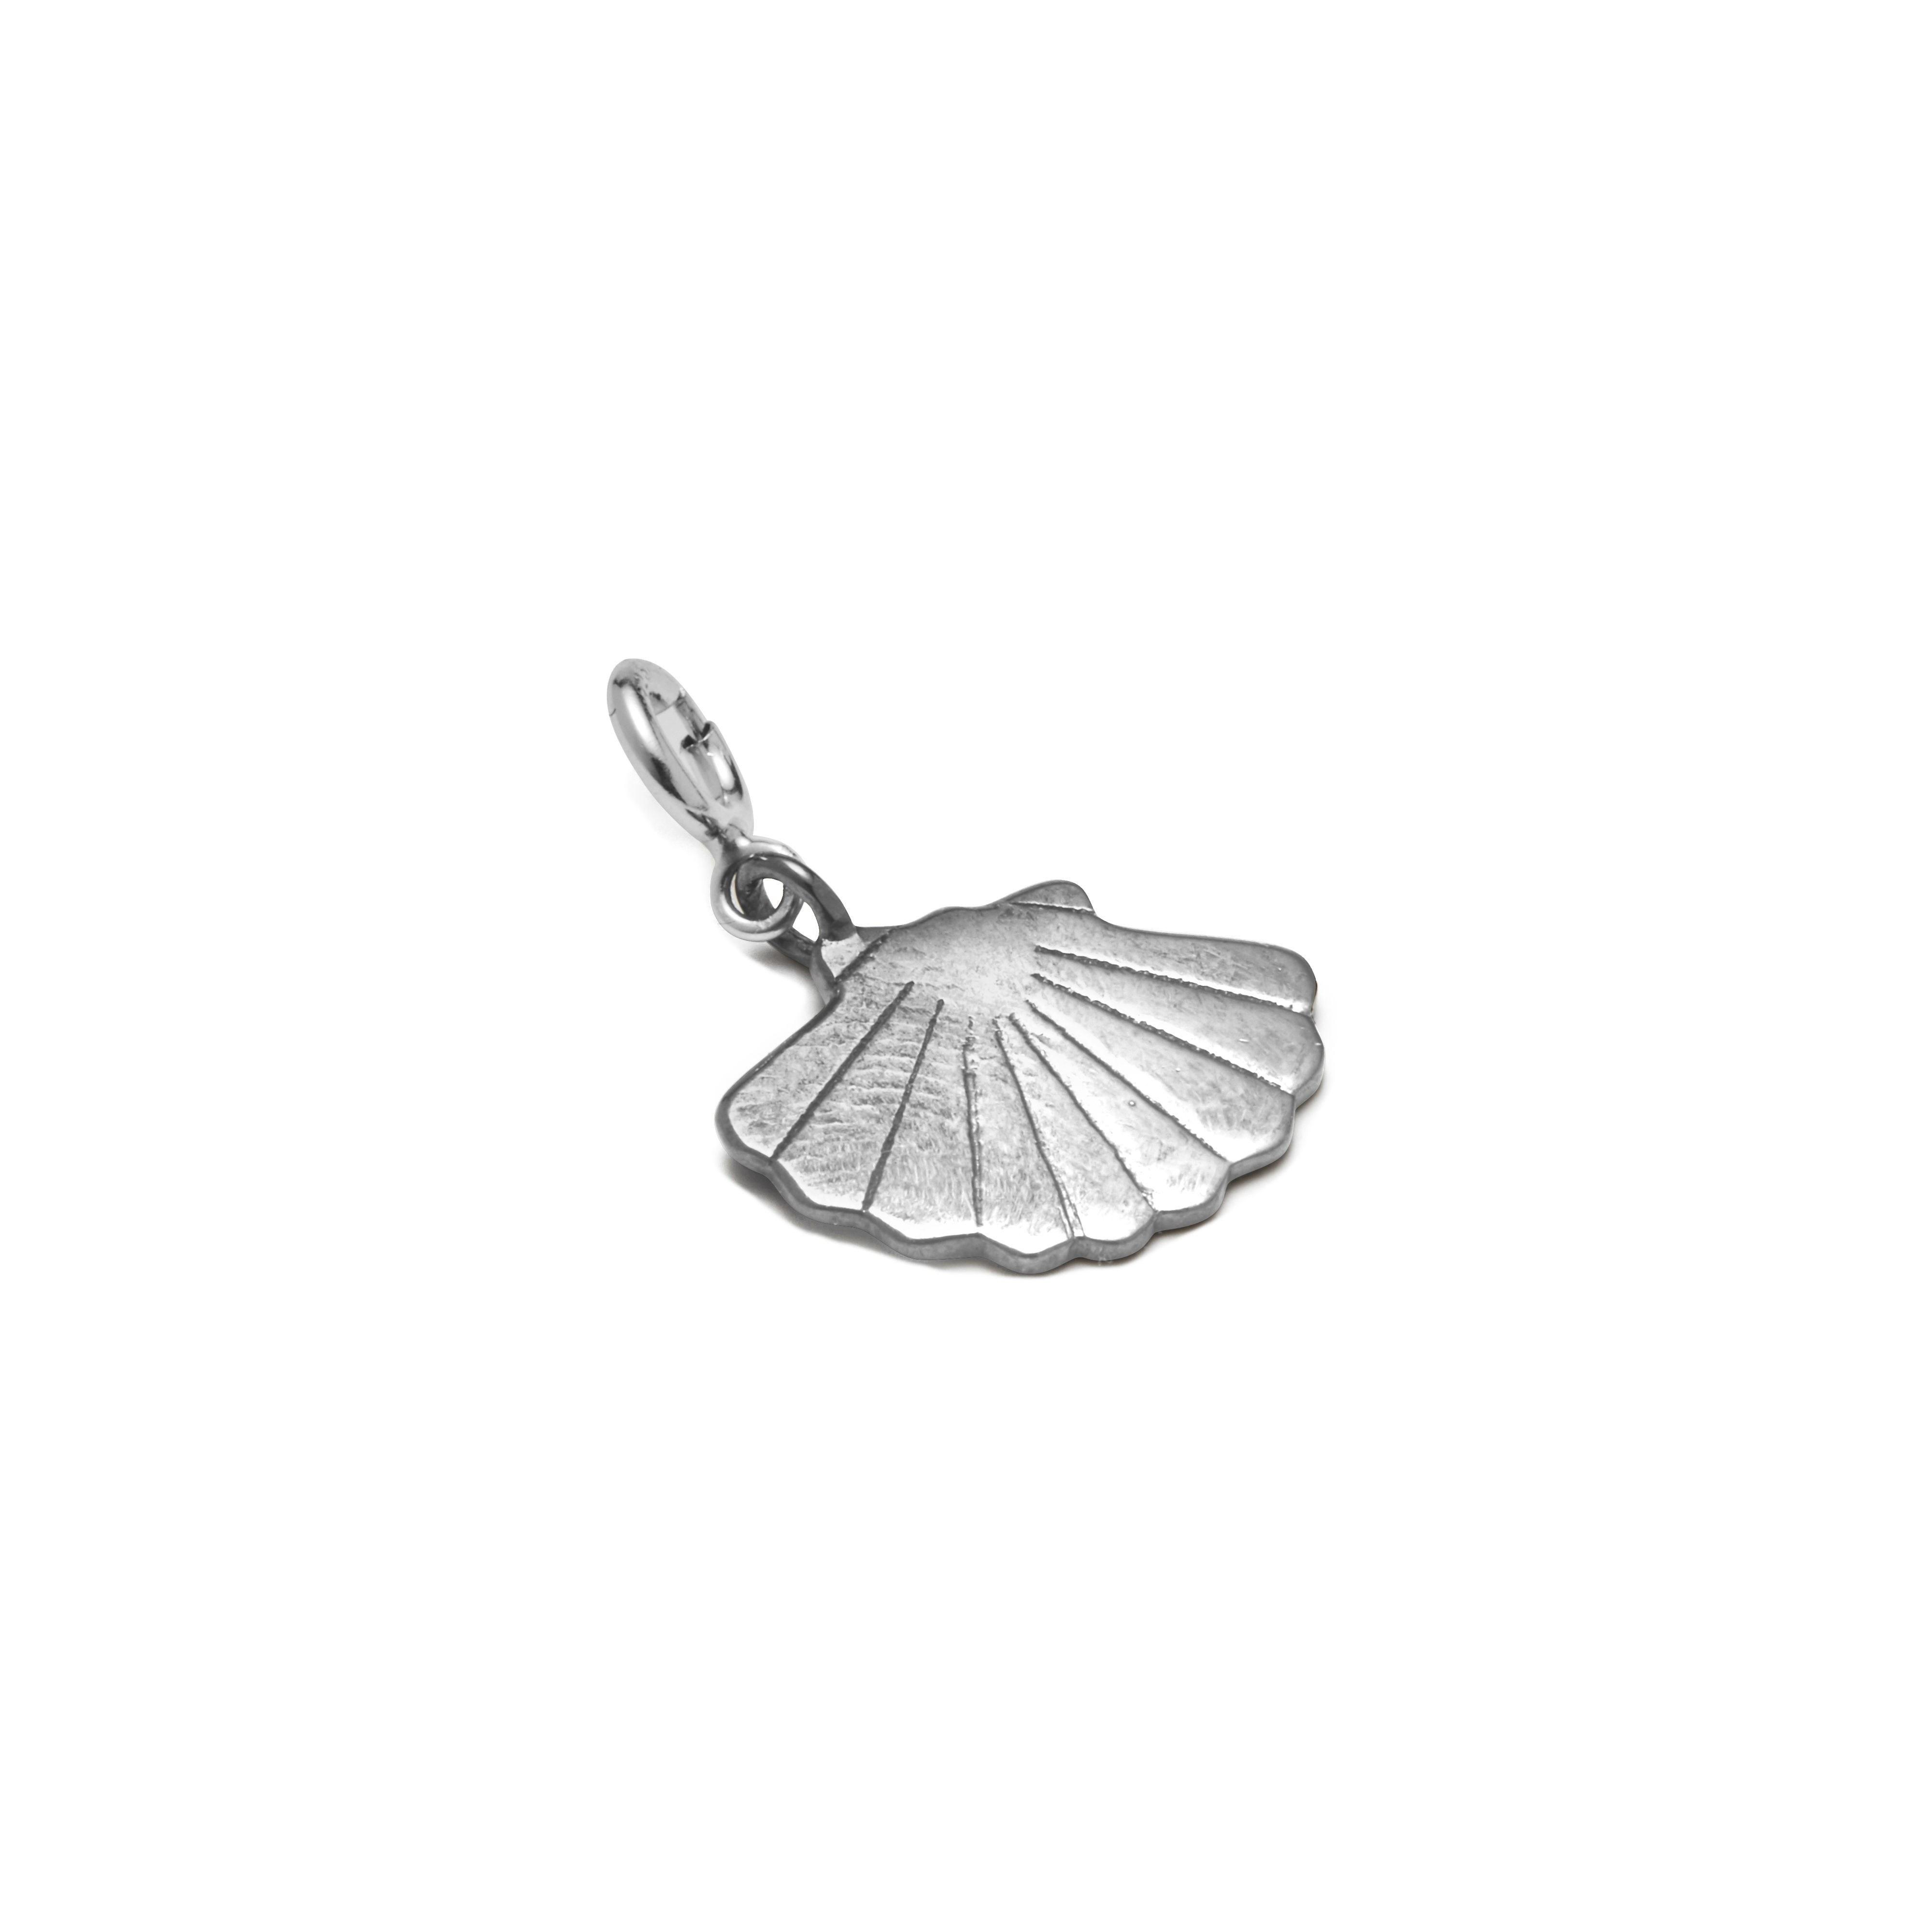 https://www.selecteddesigners.dk/media/catalog/product/h/a/hangon_05-01_ocean_silver.jpg